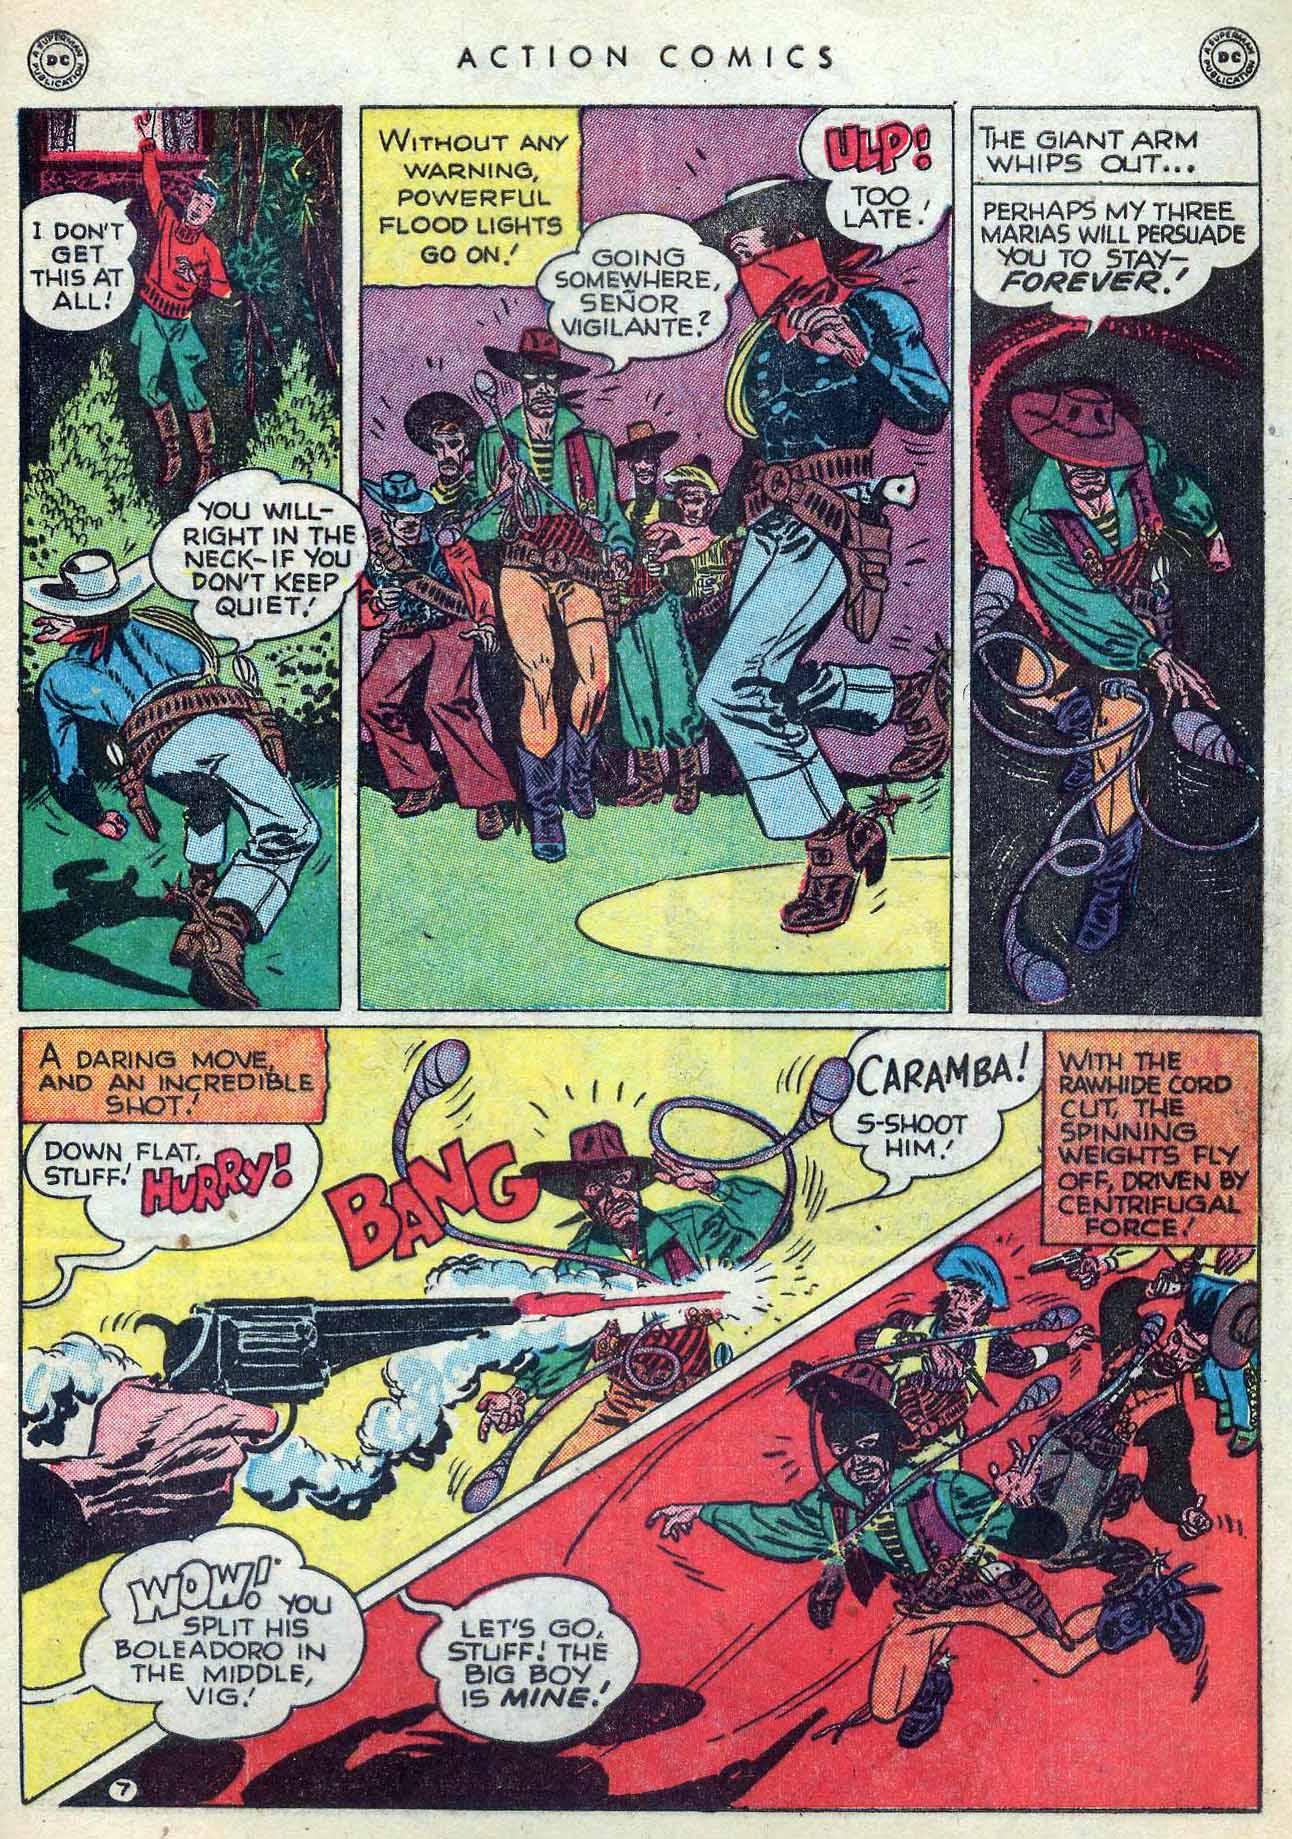 Action Comics (1938) 127 Page 48